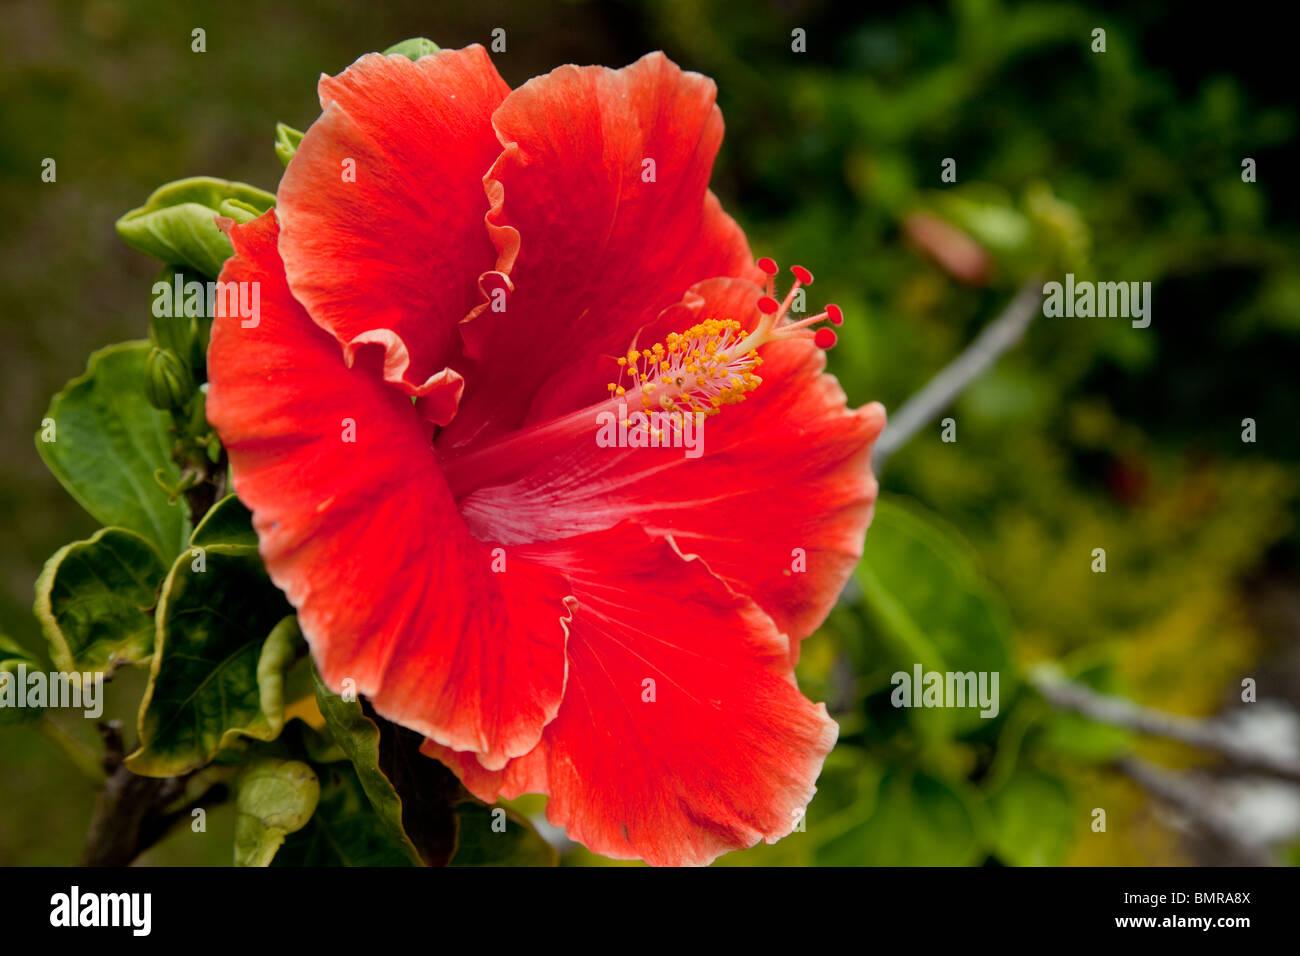 Maui Hawaii Hibiscus Flower Stock Photos Maui Hawaii Hibiscus